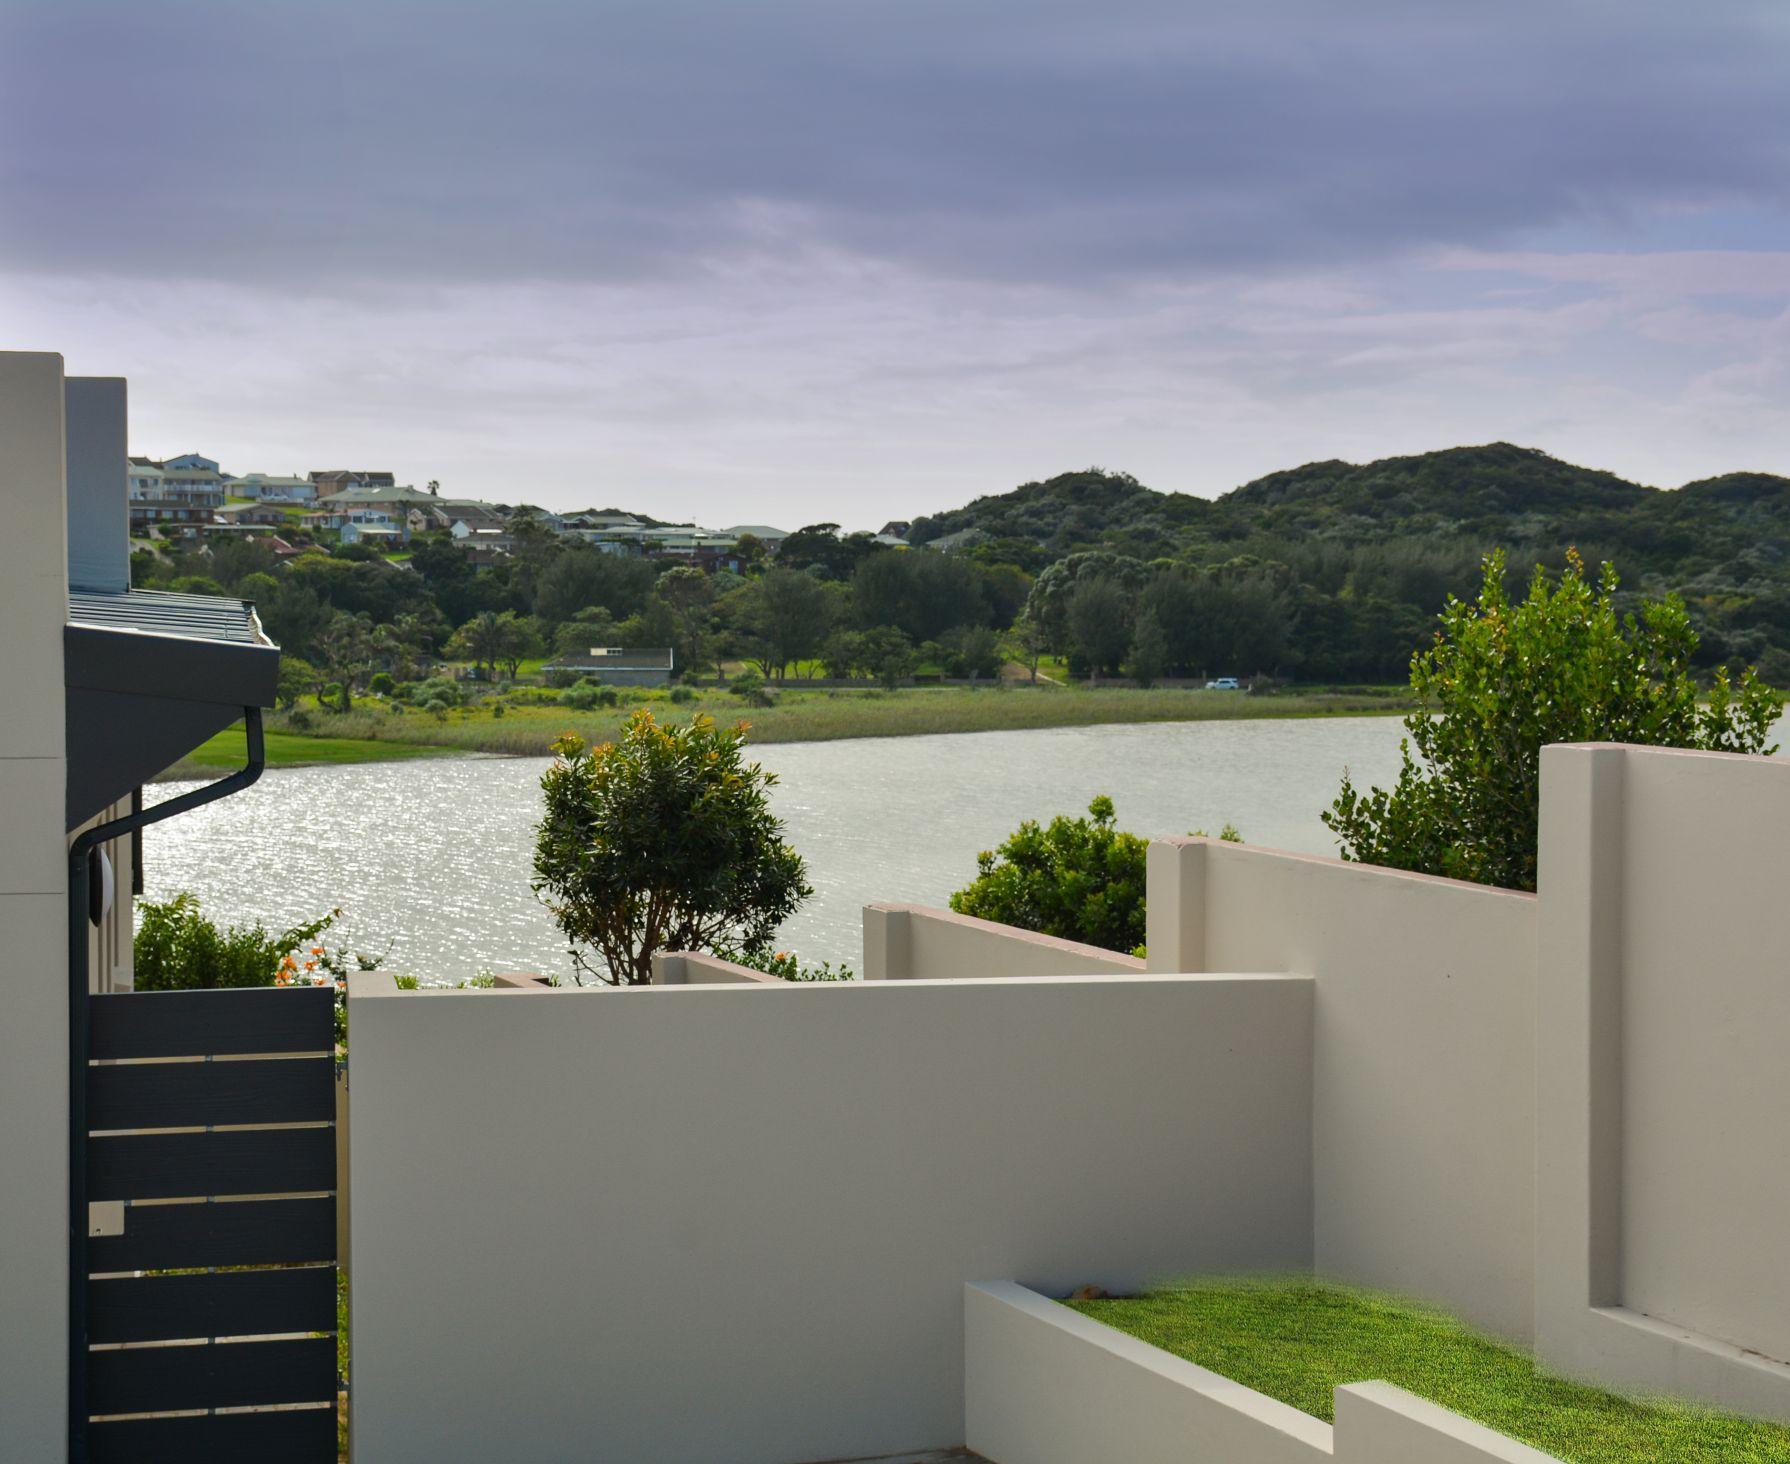 Balugha River Estate yard view of Balura River